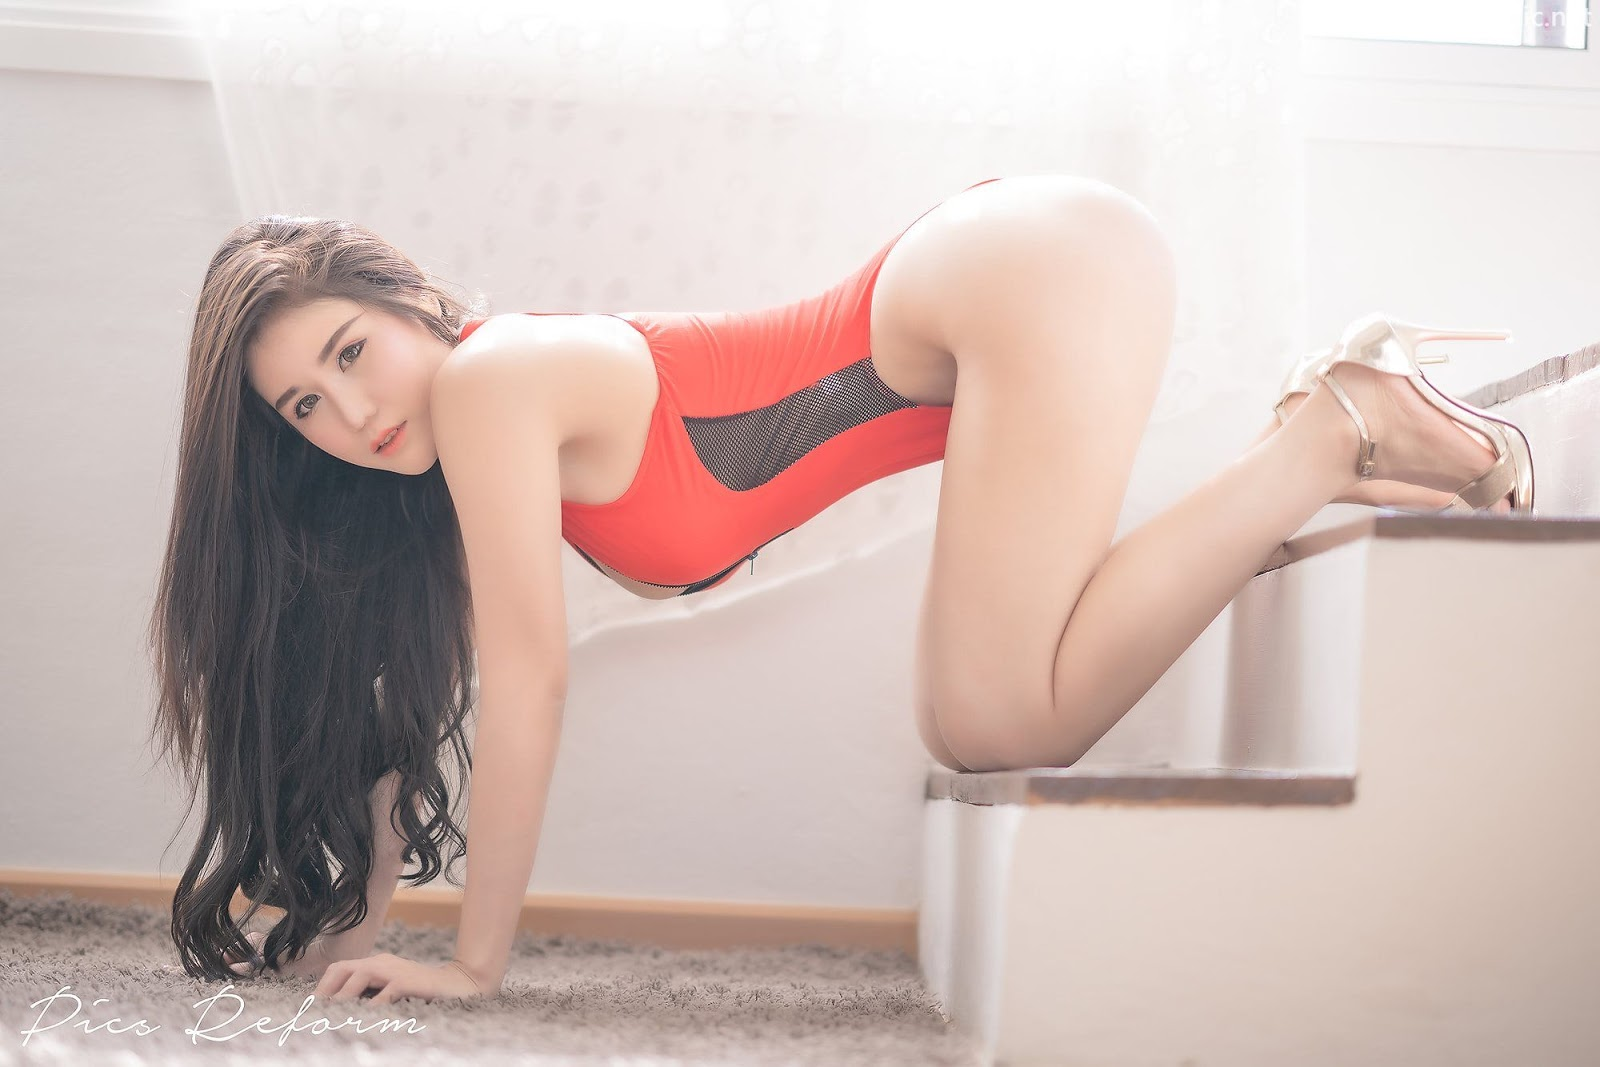 Thailand Sexy Model - Prapatsara Kongpanus - Red Army - TruePic.net - Picture 17